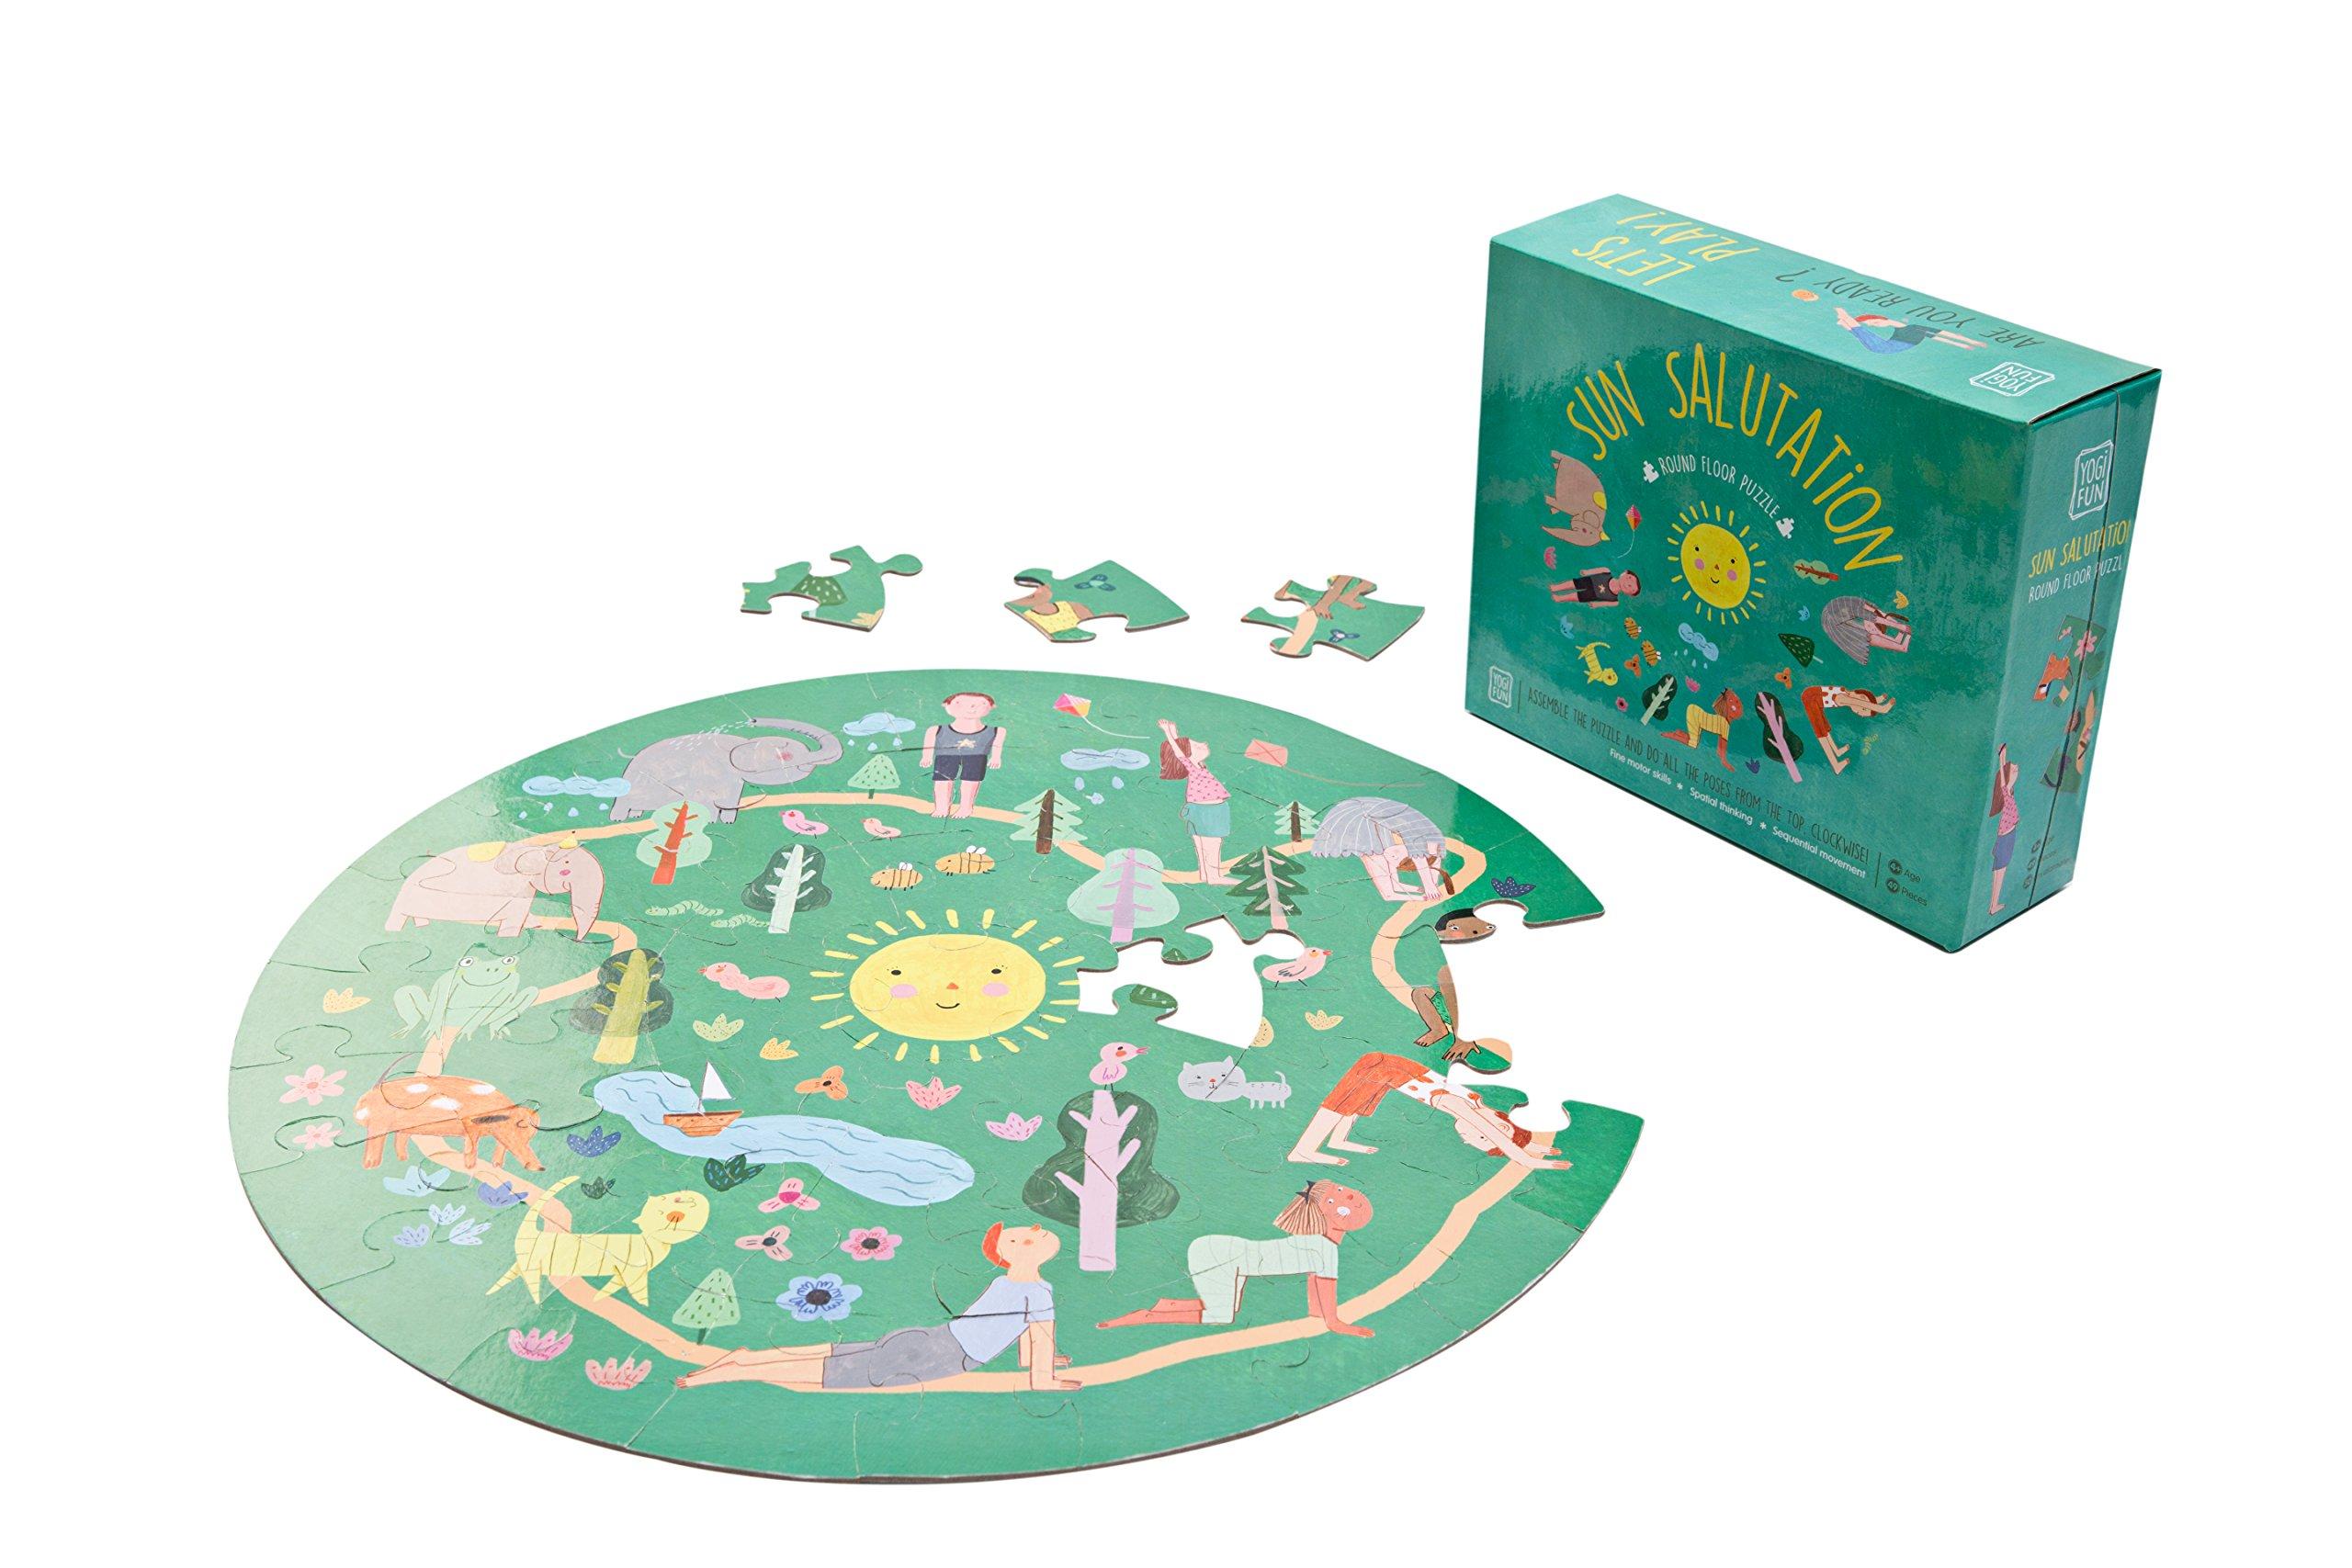 YOGi FUN Round Yoga Puzzle Games for Kids with Sun Salutation Yoga Poses by YOGi FUN